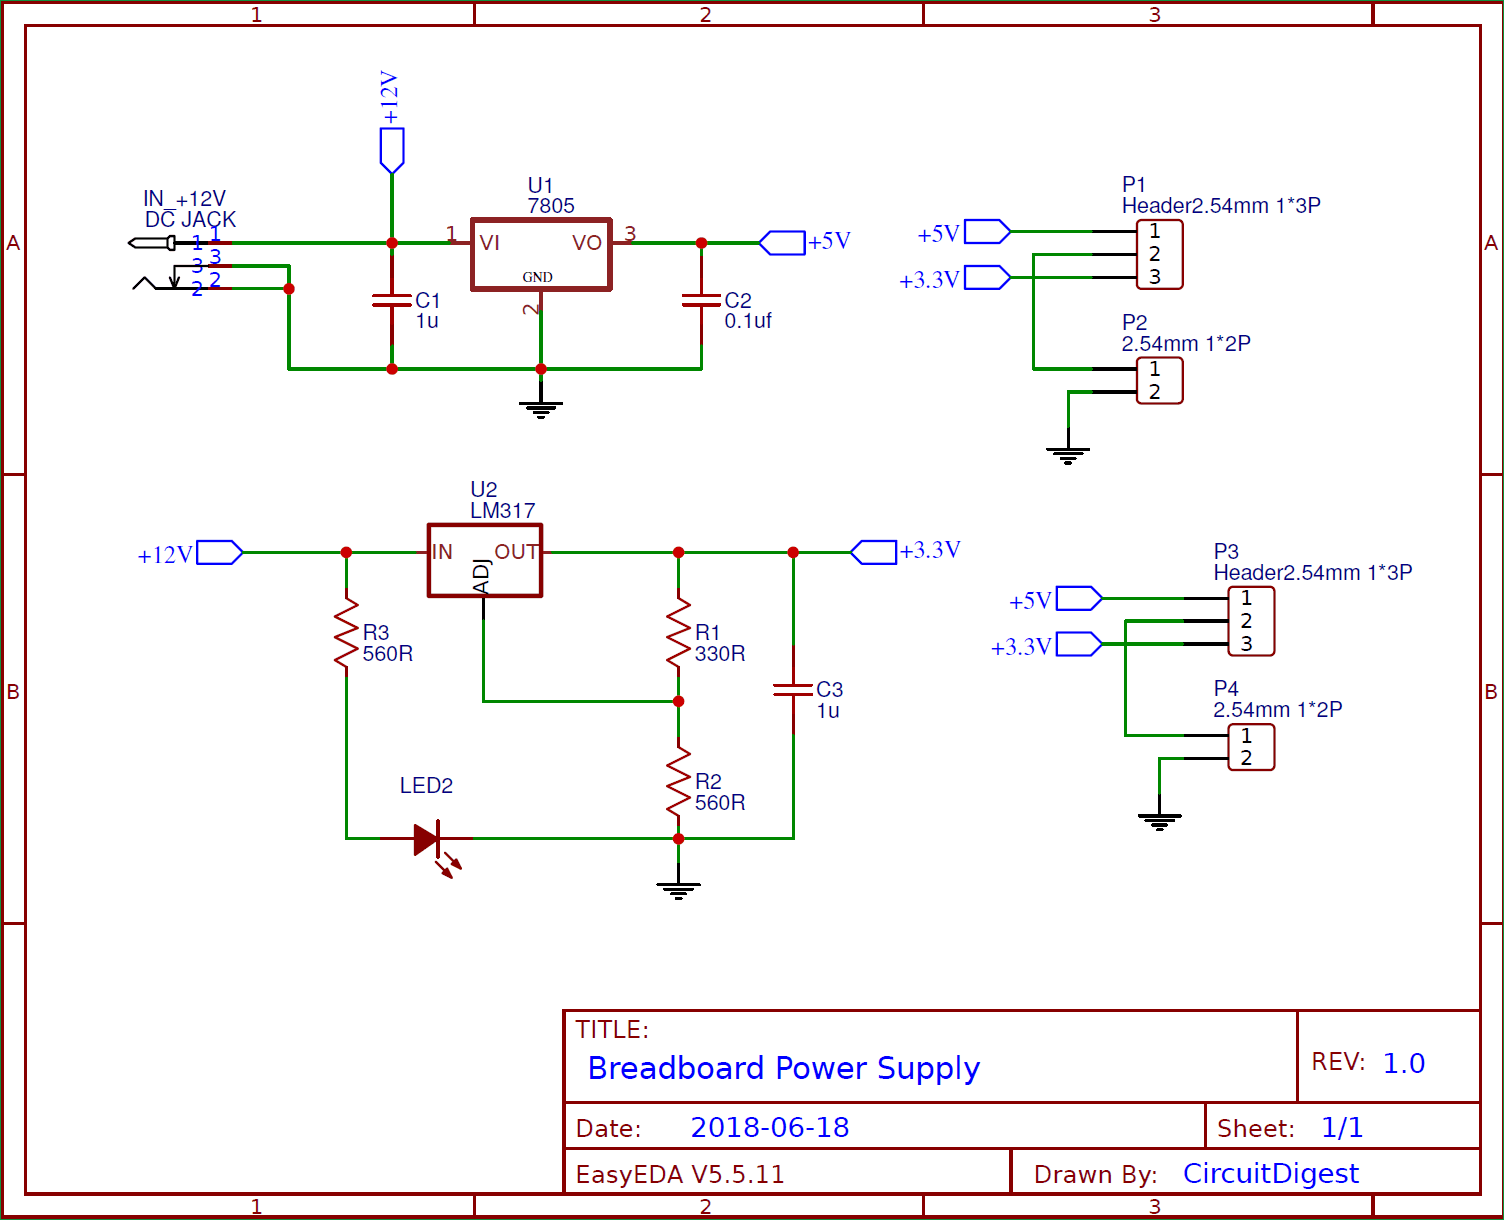 DIY Breadboard Power Supply Circuit On PCB